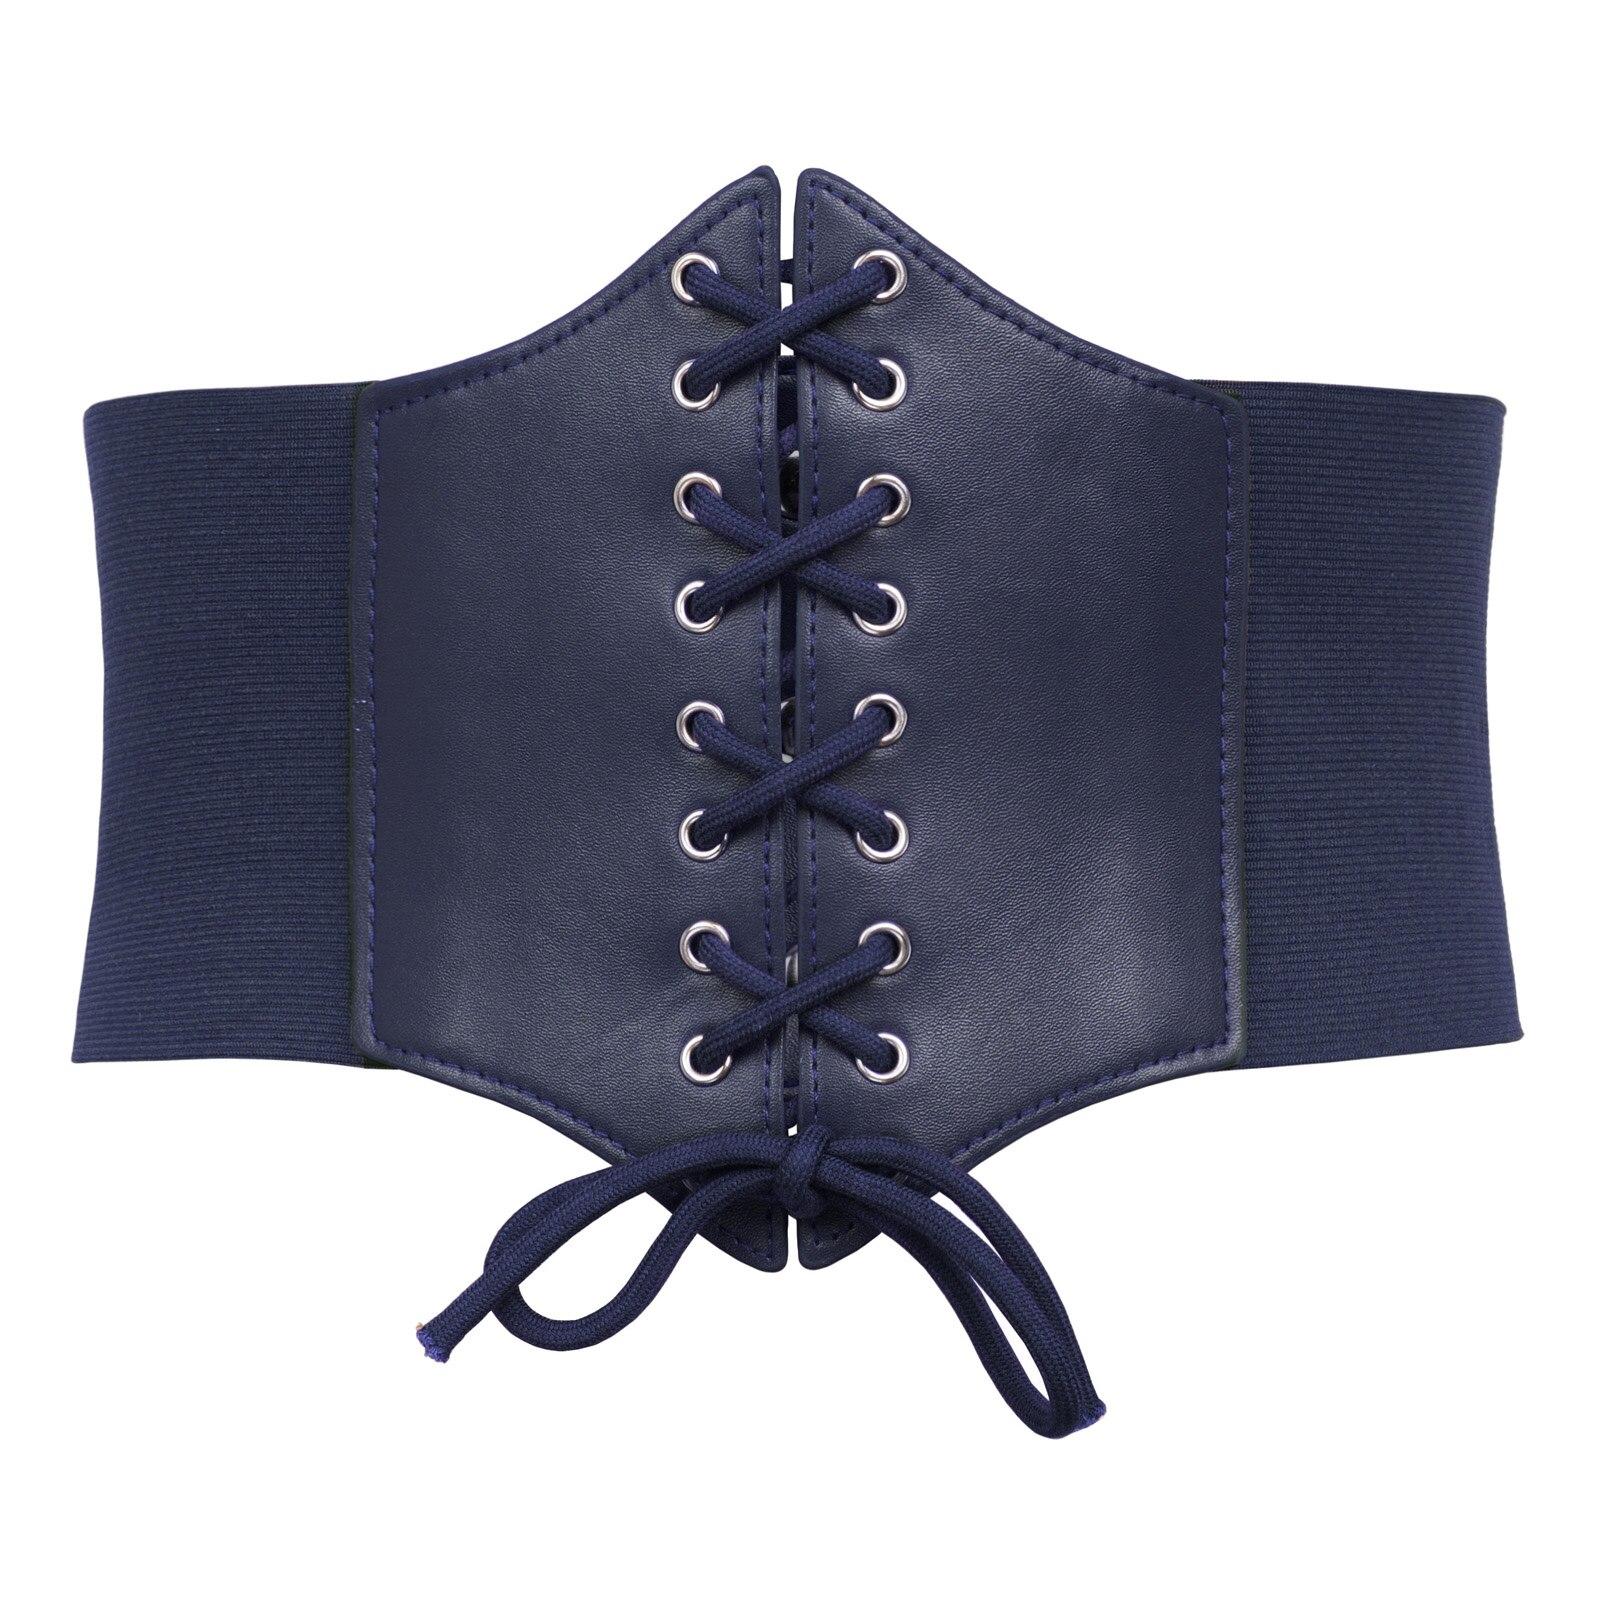 Women's Stretchy Elastic Wide Corset   Belt   Cincher Waistband Plus Size S-3XL Nice